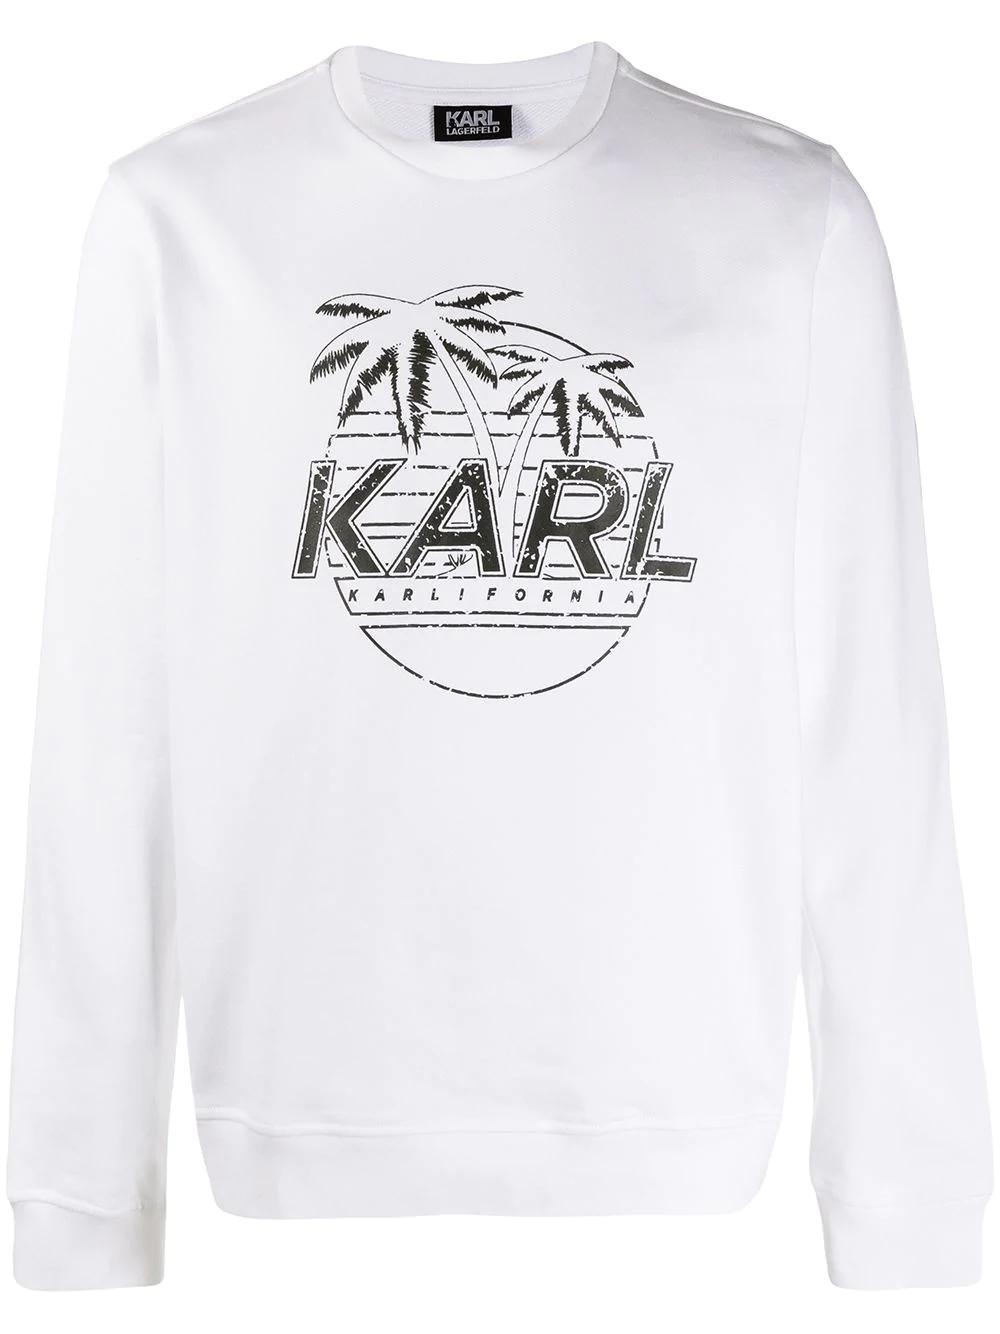 KARL LAGERFELD | Karl Lagerfeld толстовка с принтом | Clouty